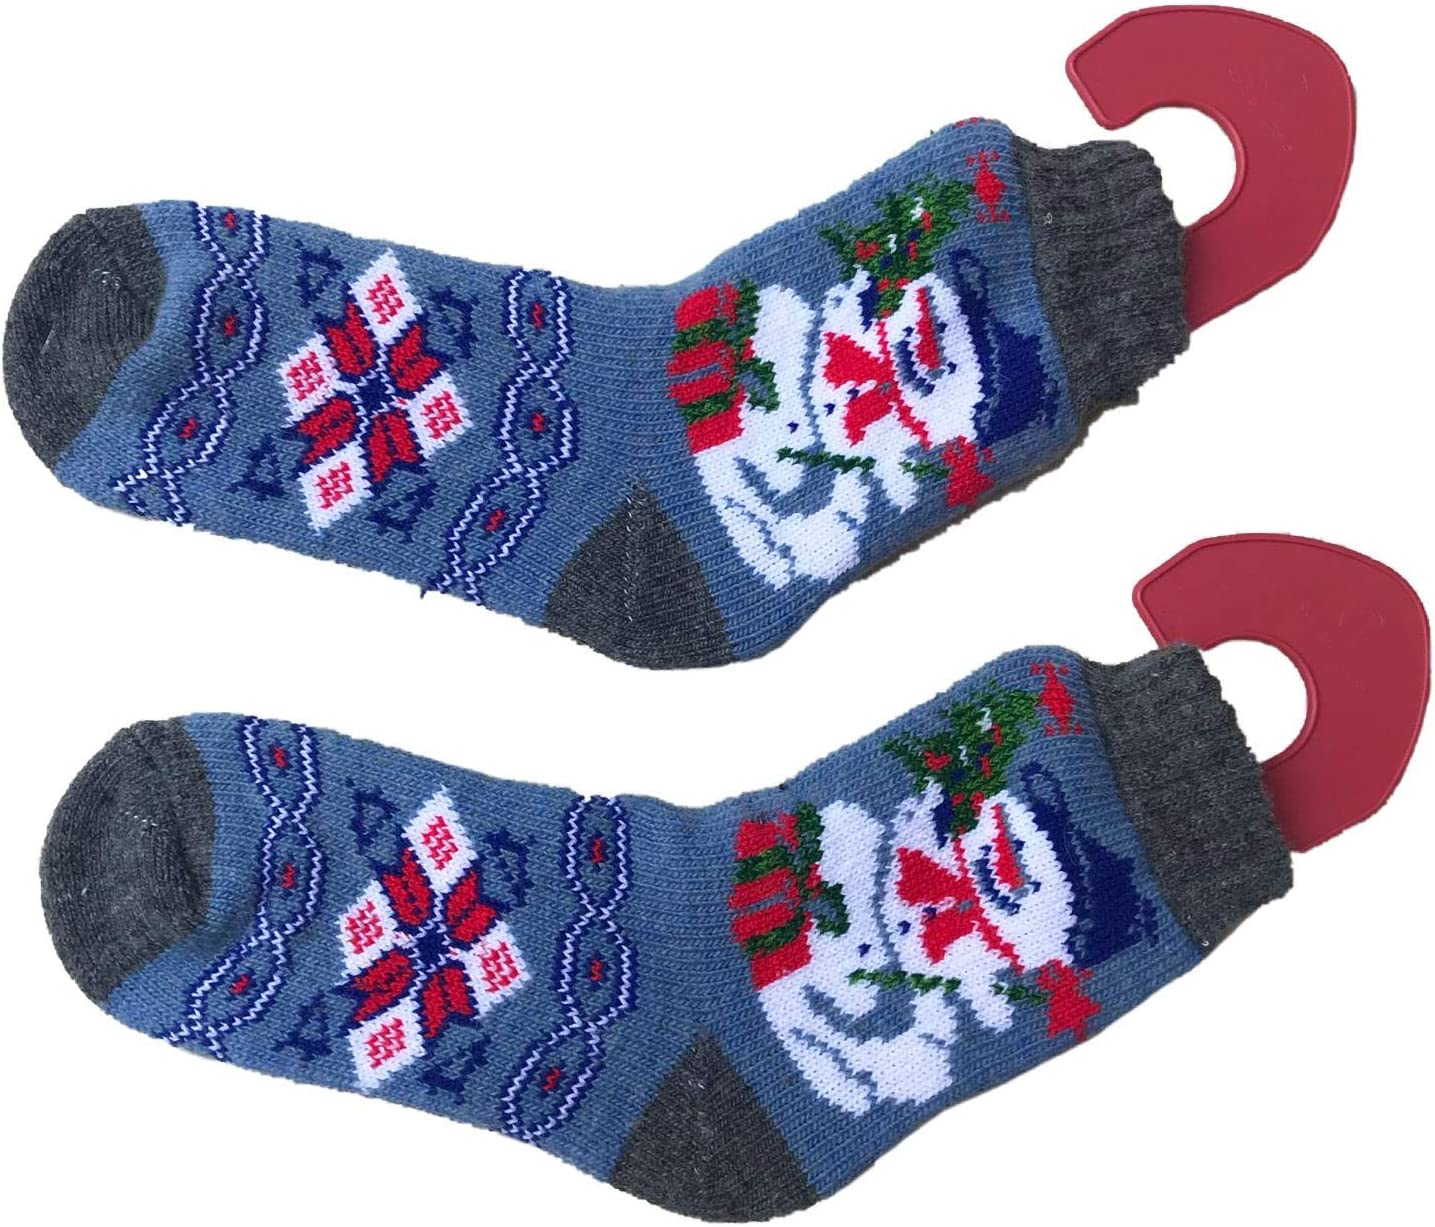 blocking knitted socks,wood sock form,knitting accessories knitters gifts Sock Blockers knitting Wooden Sock Blockers